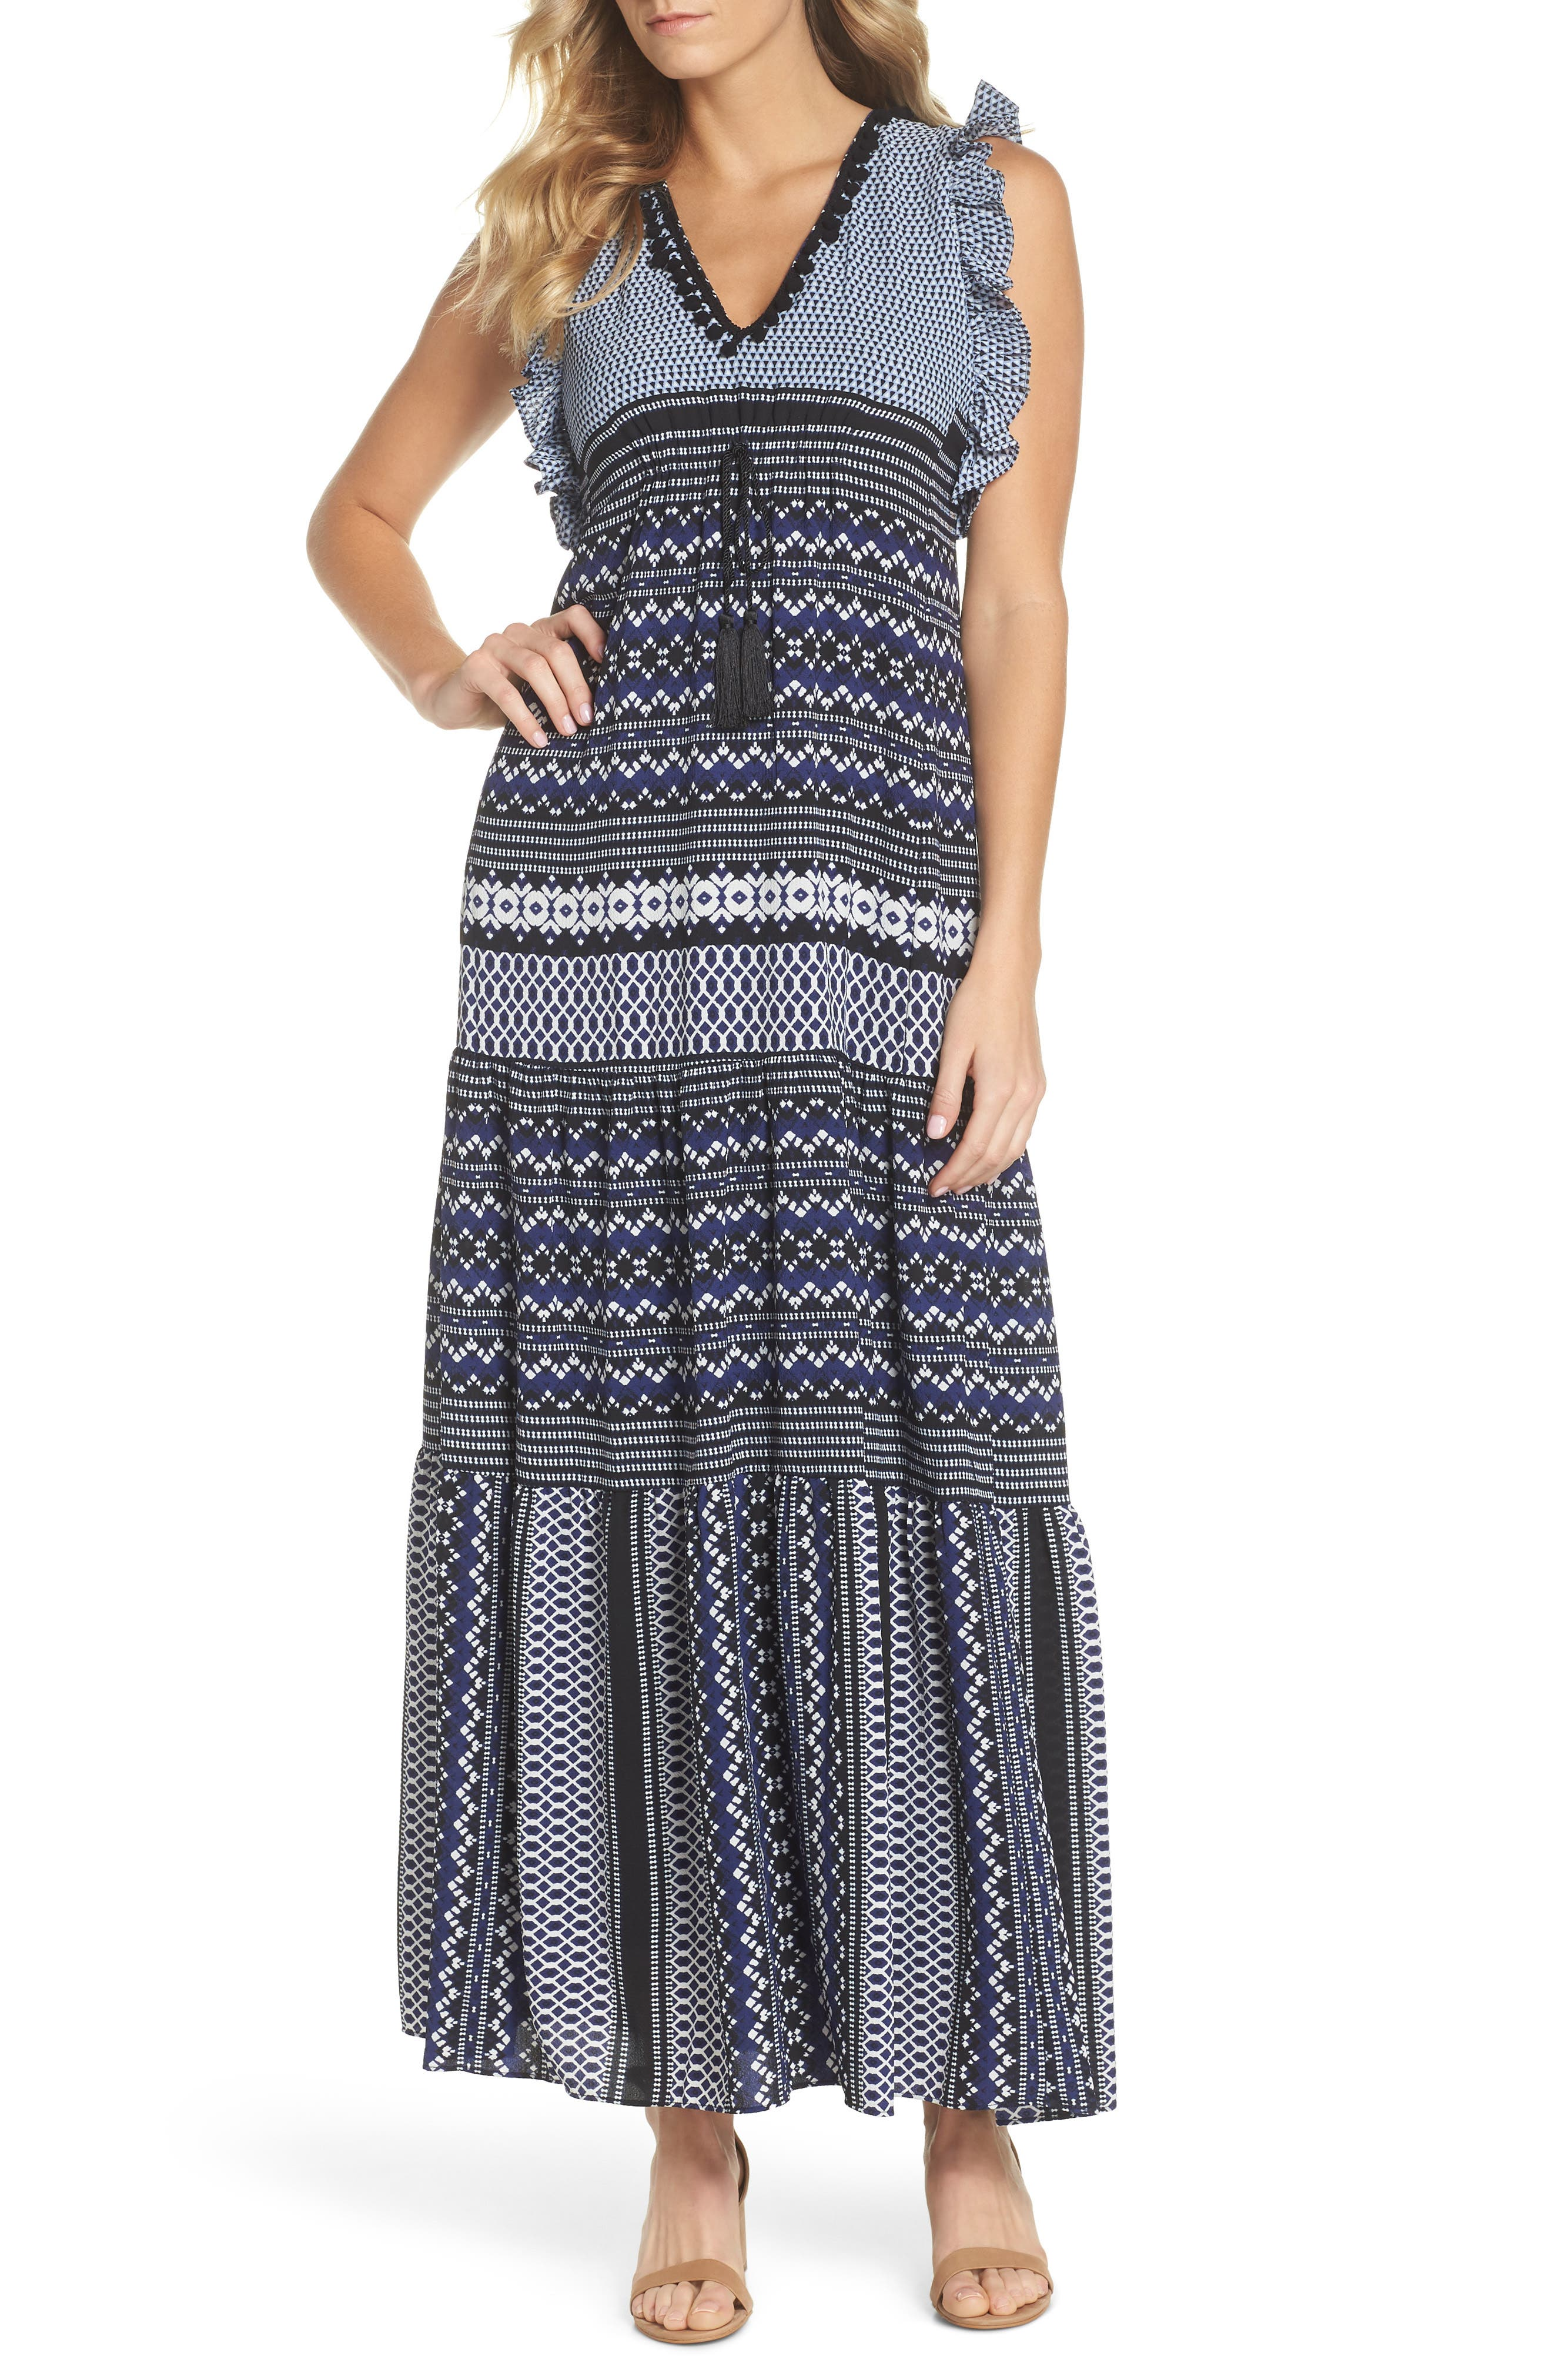 Taylor Dresses Mixed Print Ruffle Maxi Dress